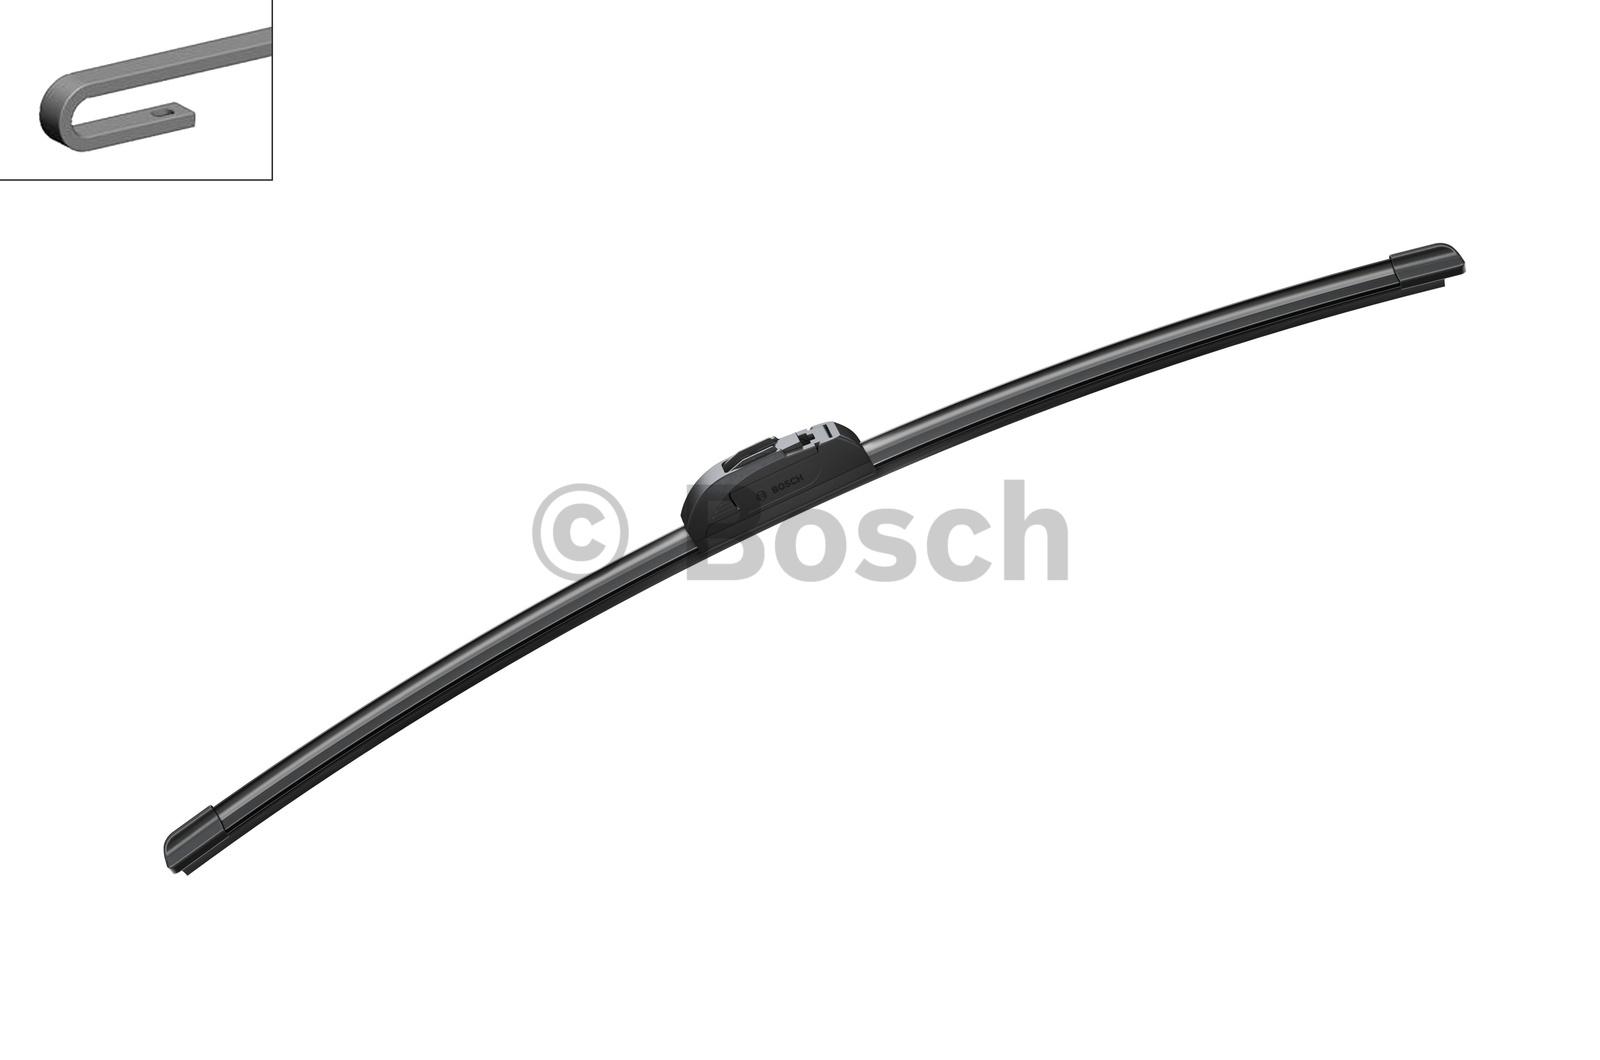 Bosch 3397008538 Щетка бескаркасная, крючок, 600мм